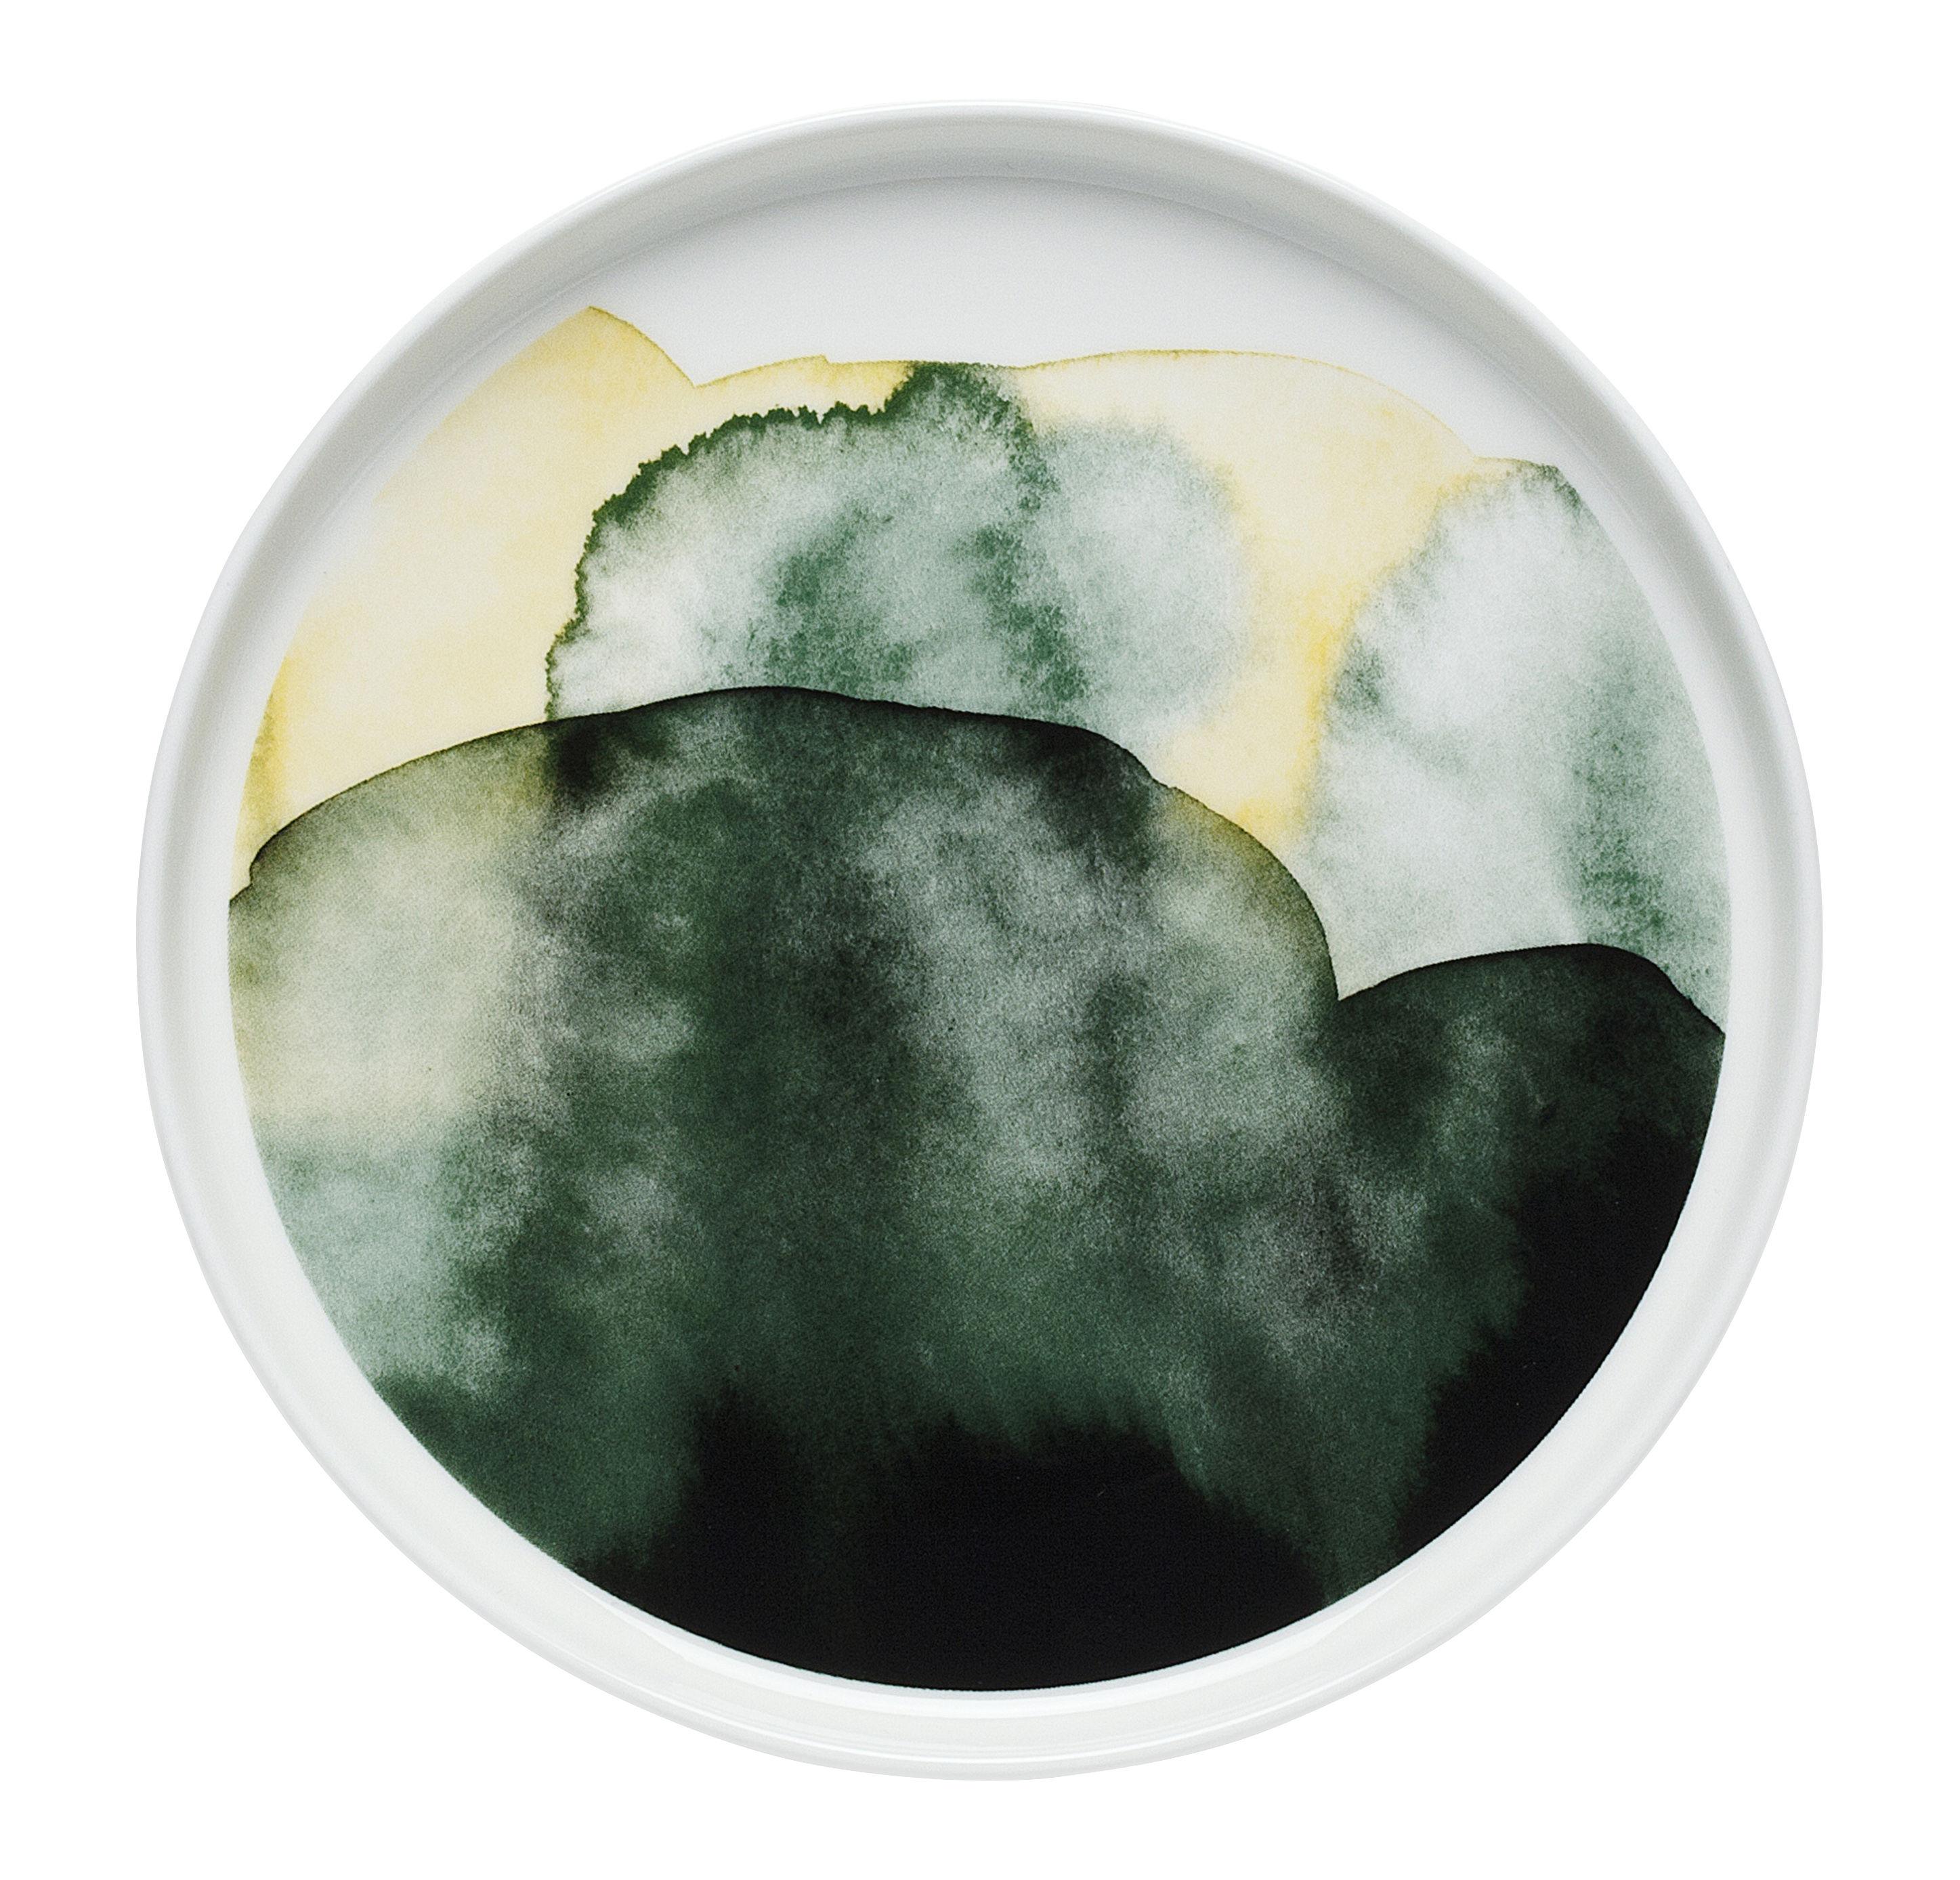 Arts de la table - Assiettes - Assiette à dessert Oiva Sääpäiväkirja / Ø 20 cm - Marimekko - Sääpäiväkirja / Vert - Porcelaine